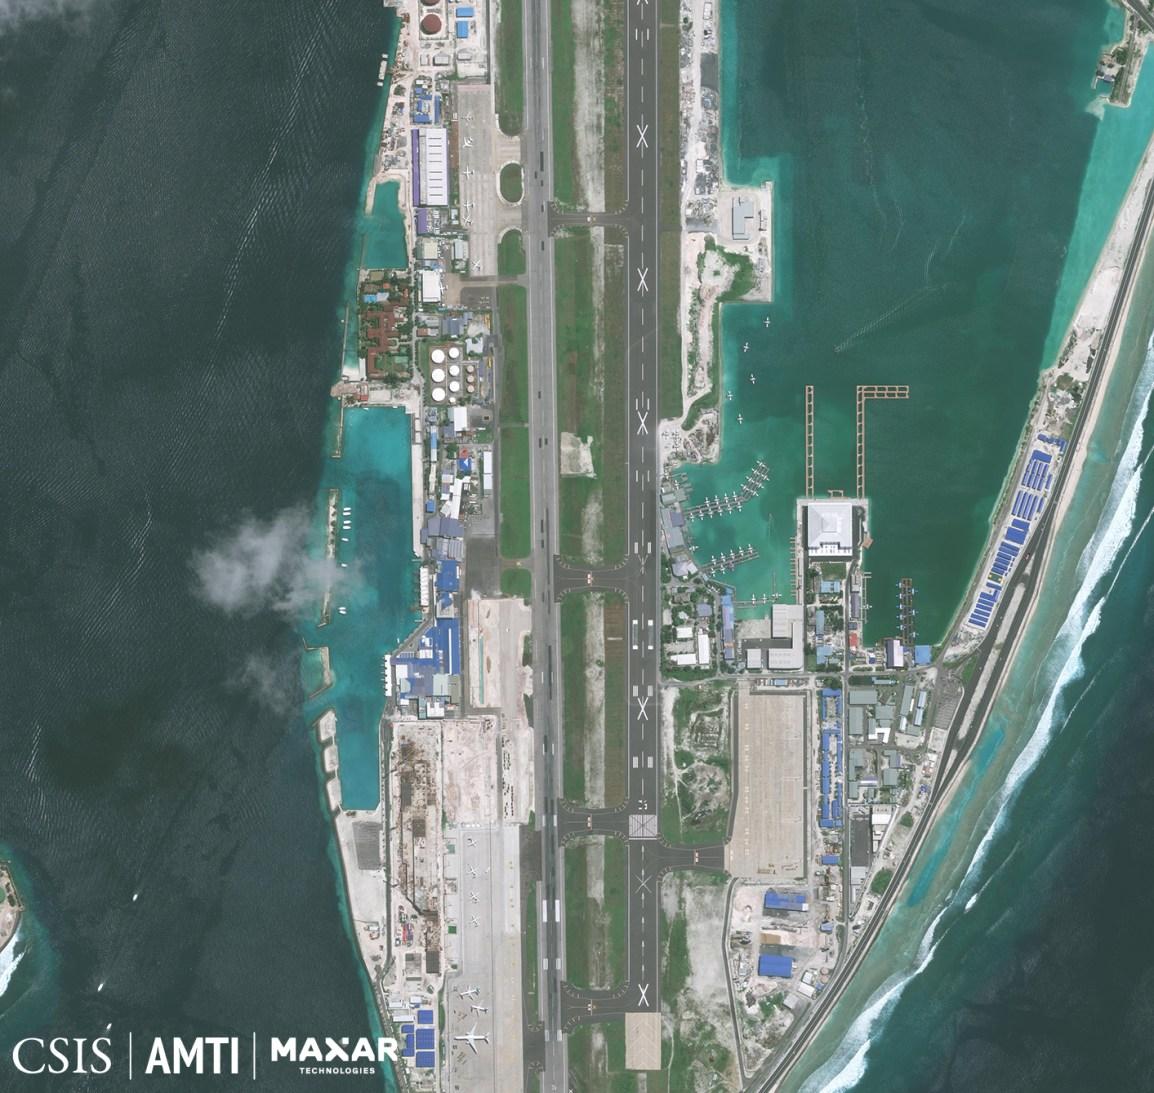 Velana International Airport (South), August 22, 2020